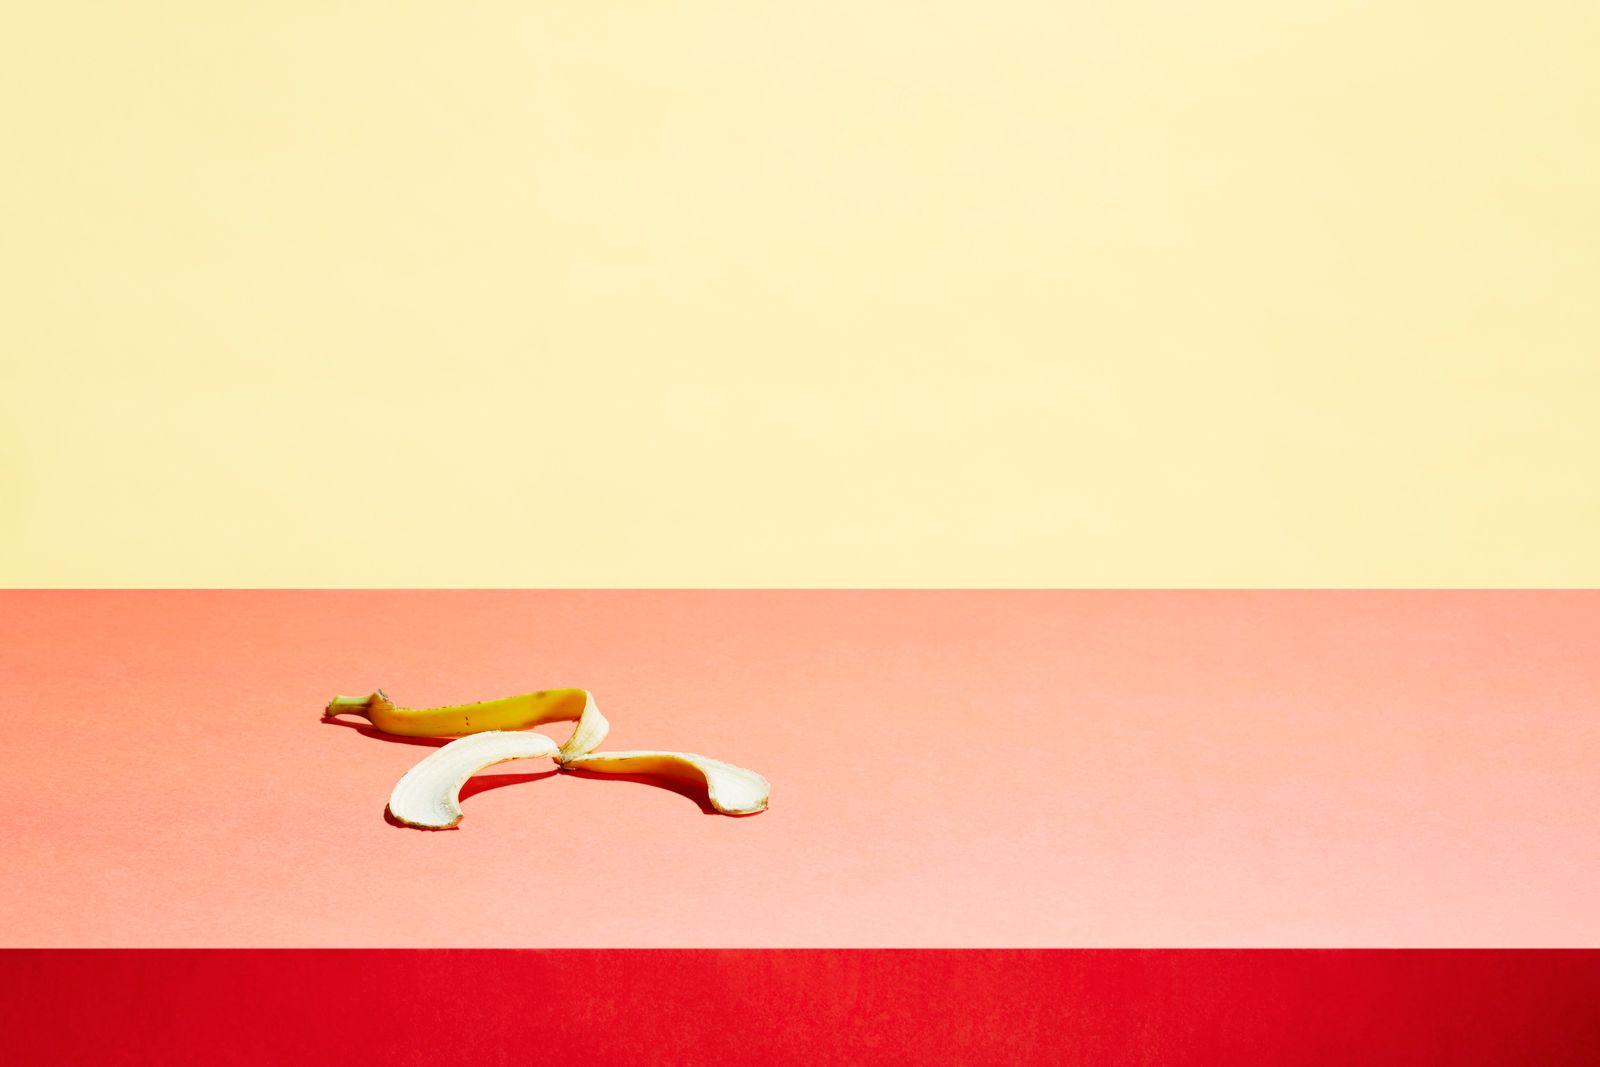 Banana skin in a table top